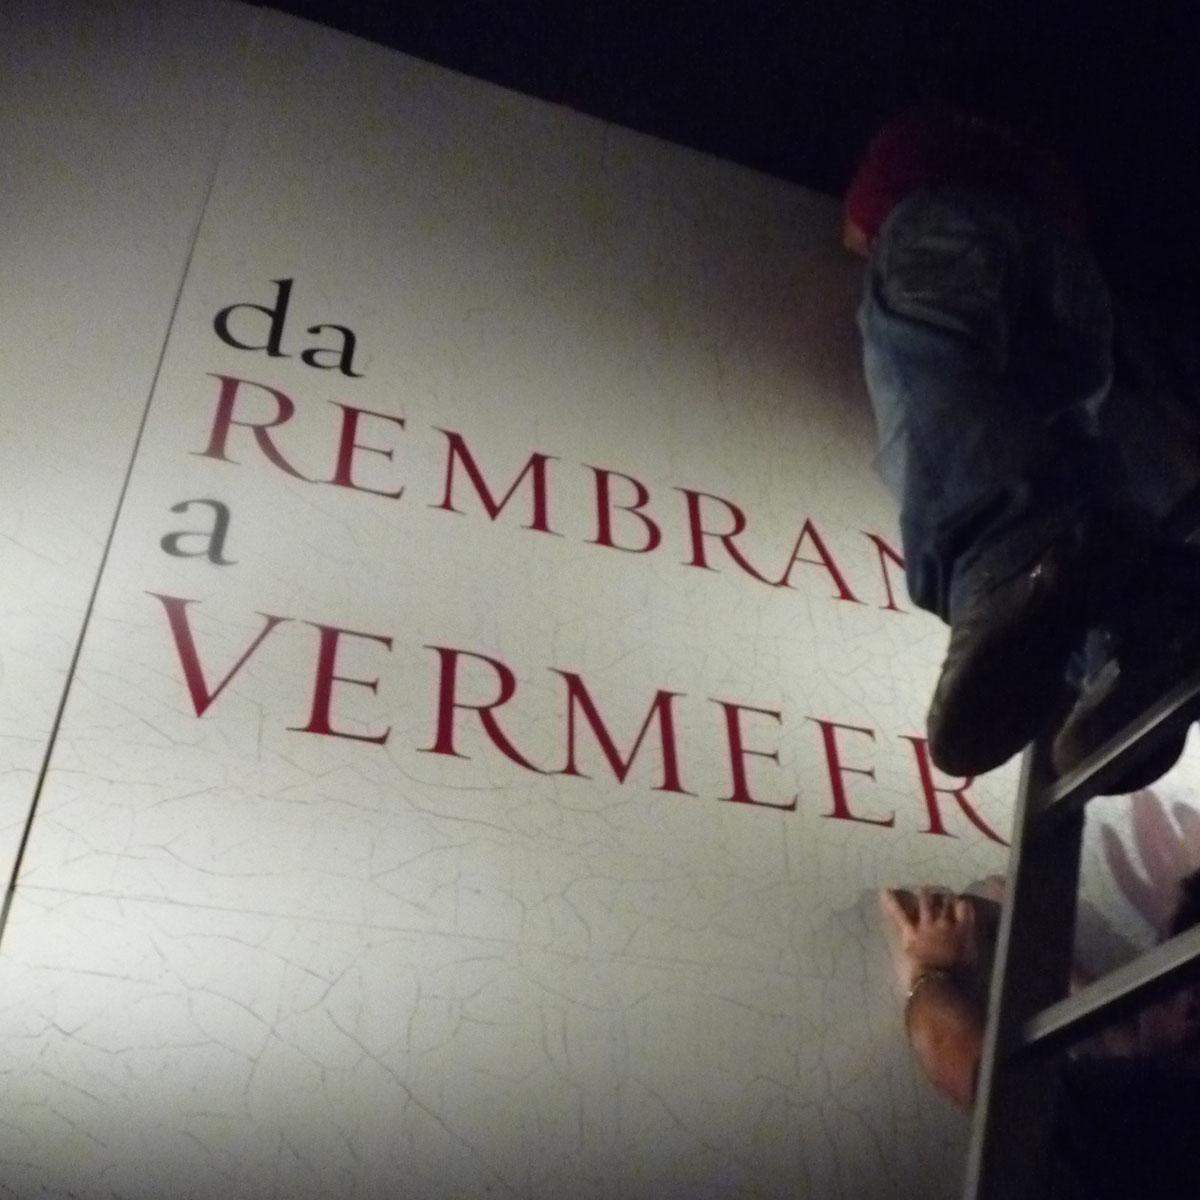 Da-Rembrandt-a-Vermeer-002